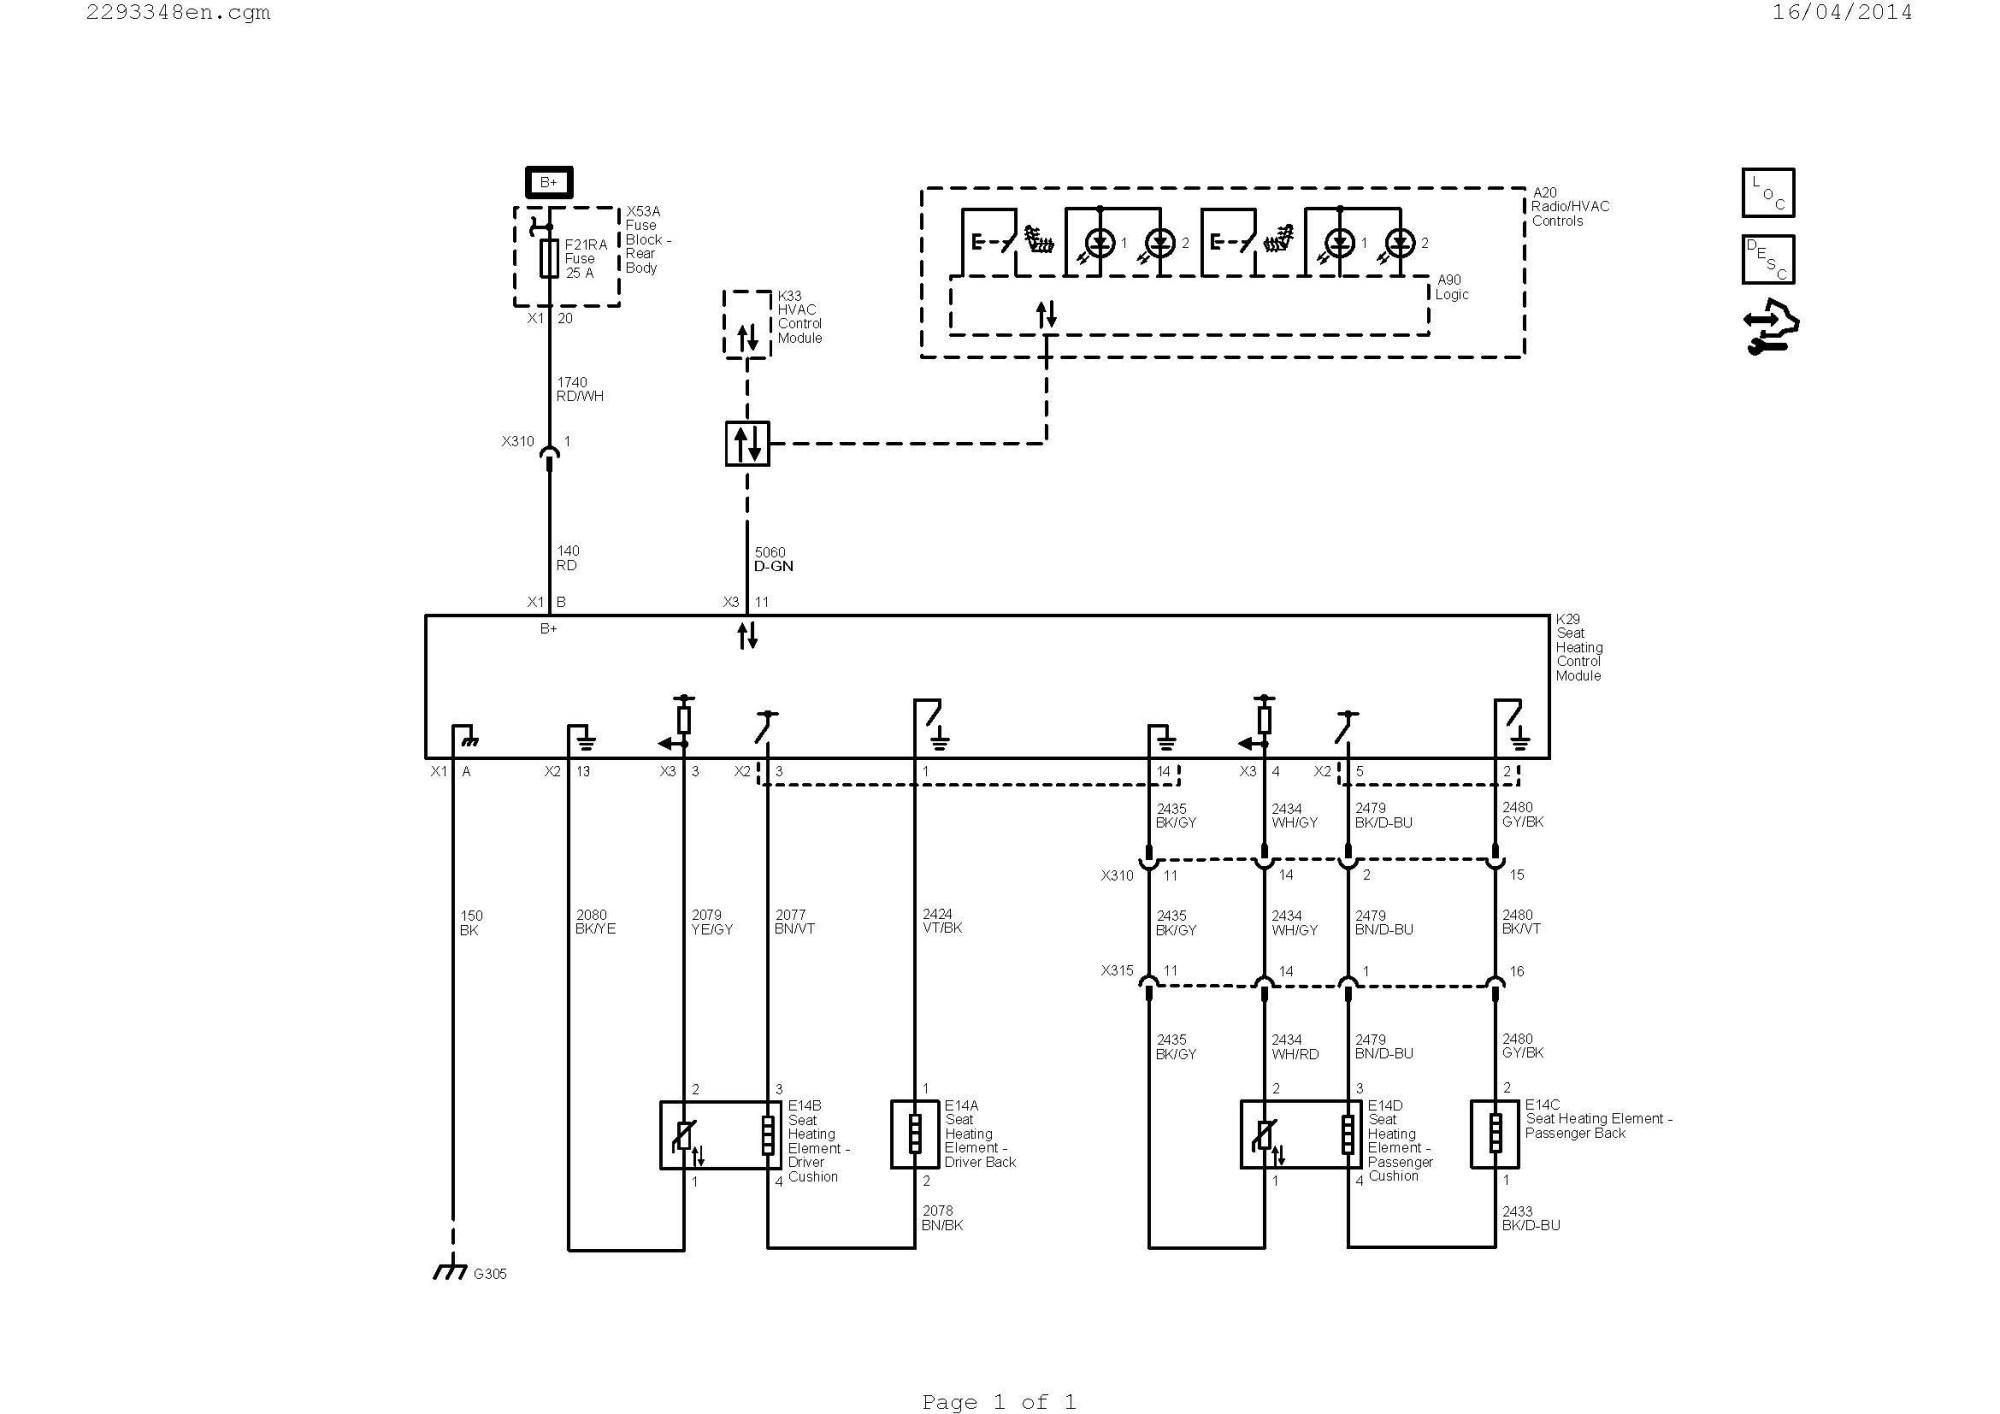 hight resolution of spaguts wiring diagram wiring diagram m6 spaguts wiring diagram spaguts wiring diagram source spaguts vs300fc5 circuit board